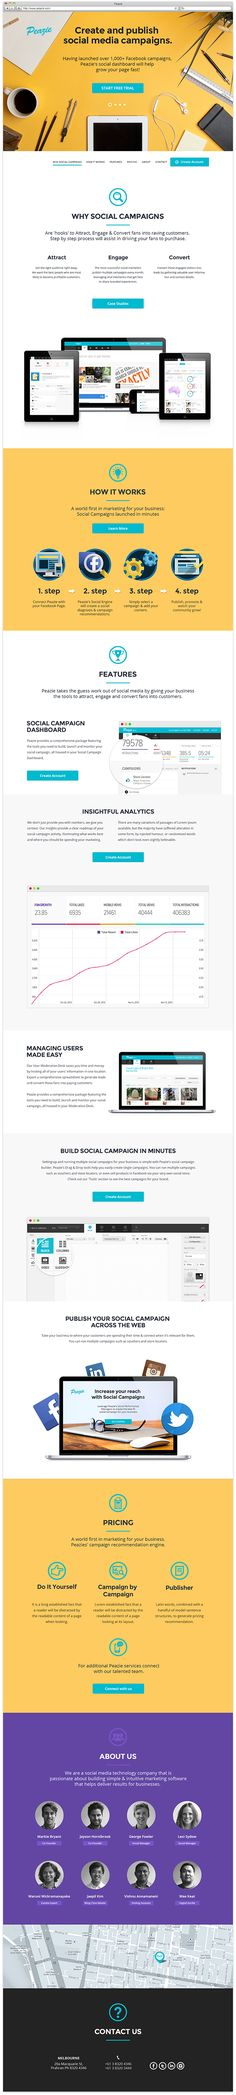 Peazie #Web #Design #WebDesign  | web design inspiration | digital media arts…